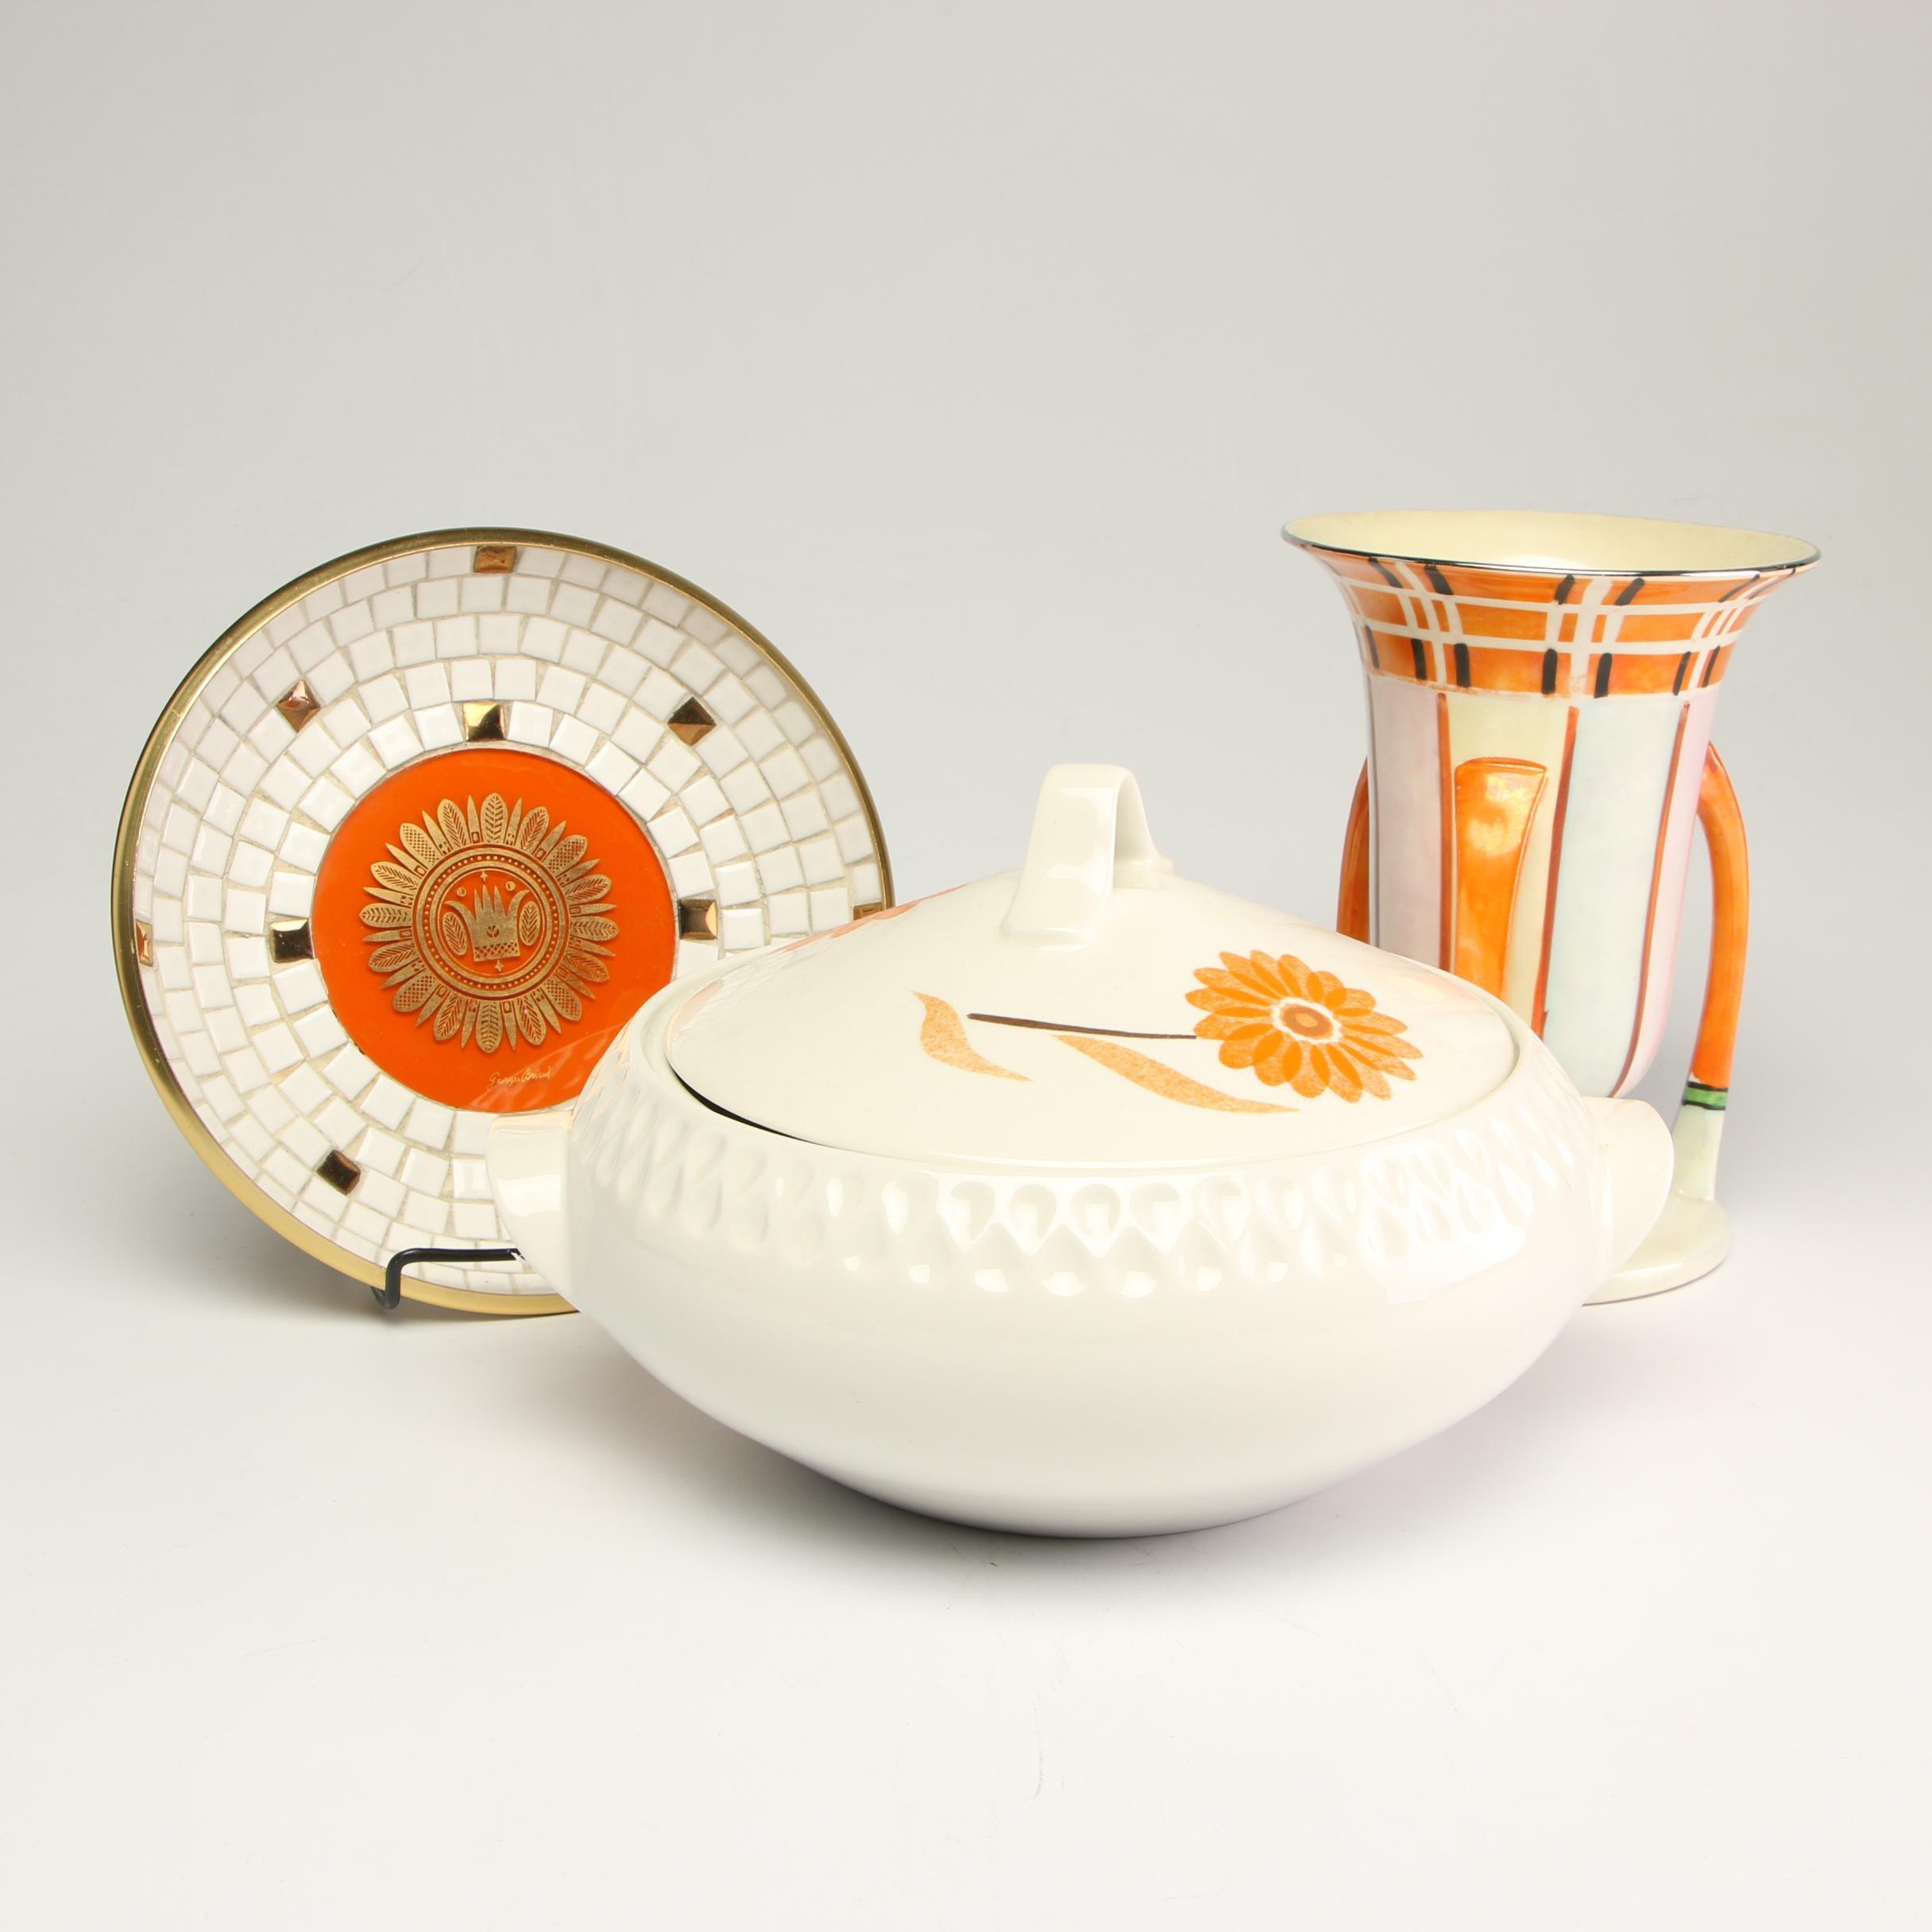 Mid Century Modern Iroquois China Casserole Dish and Other Serveware